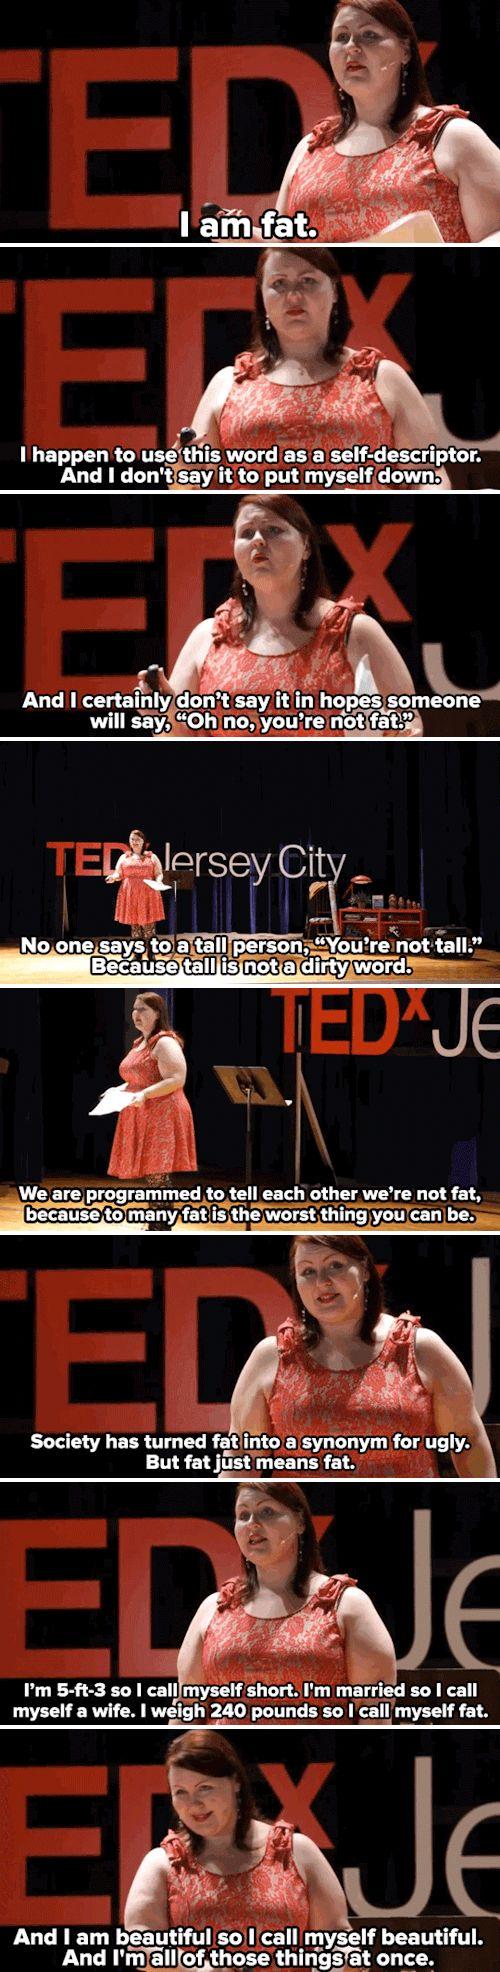 preach it girl